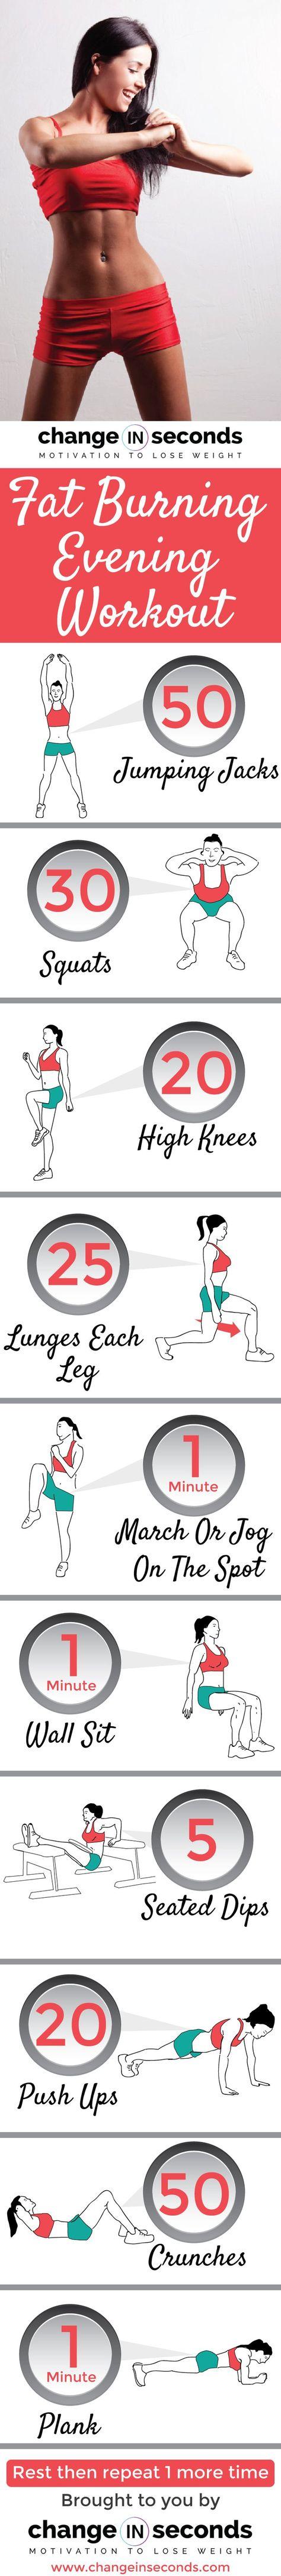 Fat Burning Evening Workout (Download PDF) http://www.changeinseconds.com/fat-burning-evening-workout/